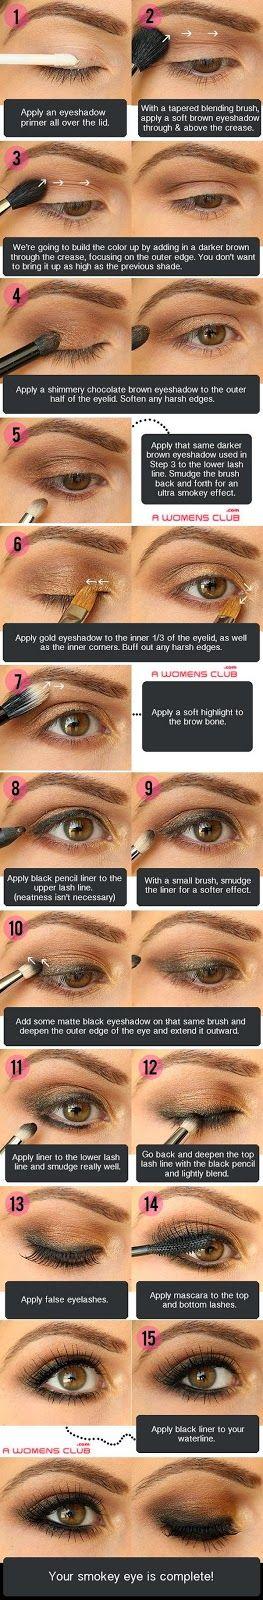 Bobby brown smokey eye tutorial | Different approach for a dramatic smokey eye - Tenacity Solution